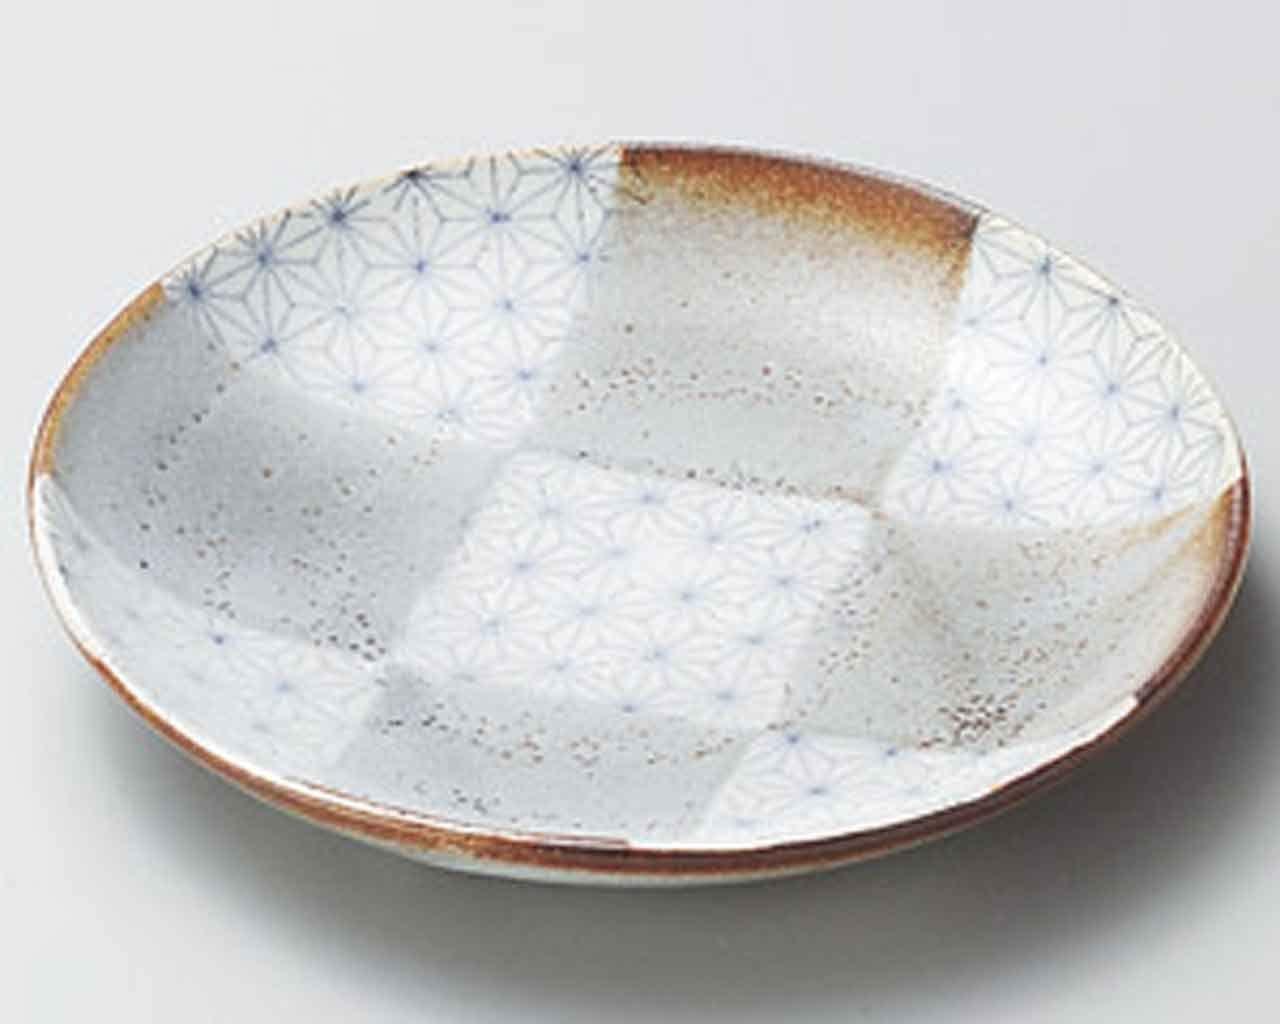 Sashiko Ichimatsu 7.2inch Set of 5 Medium Plates White Ceramic Made in Japan